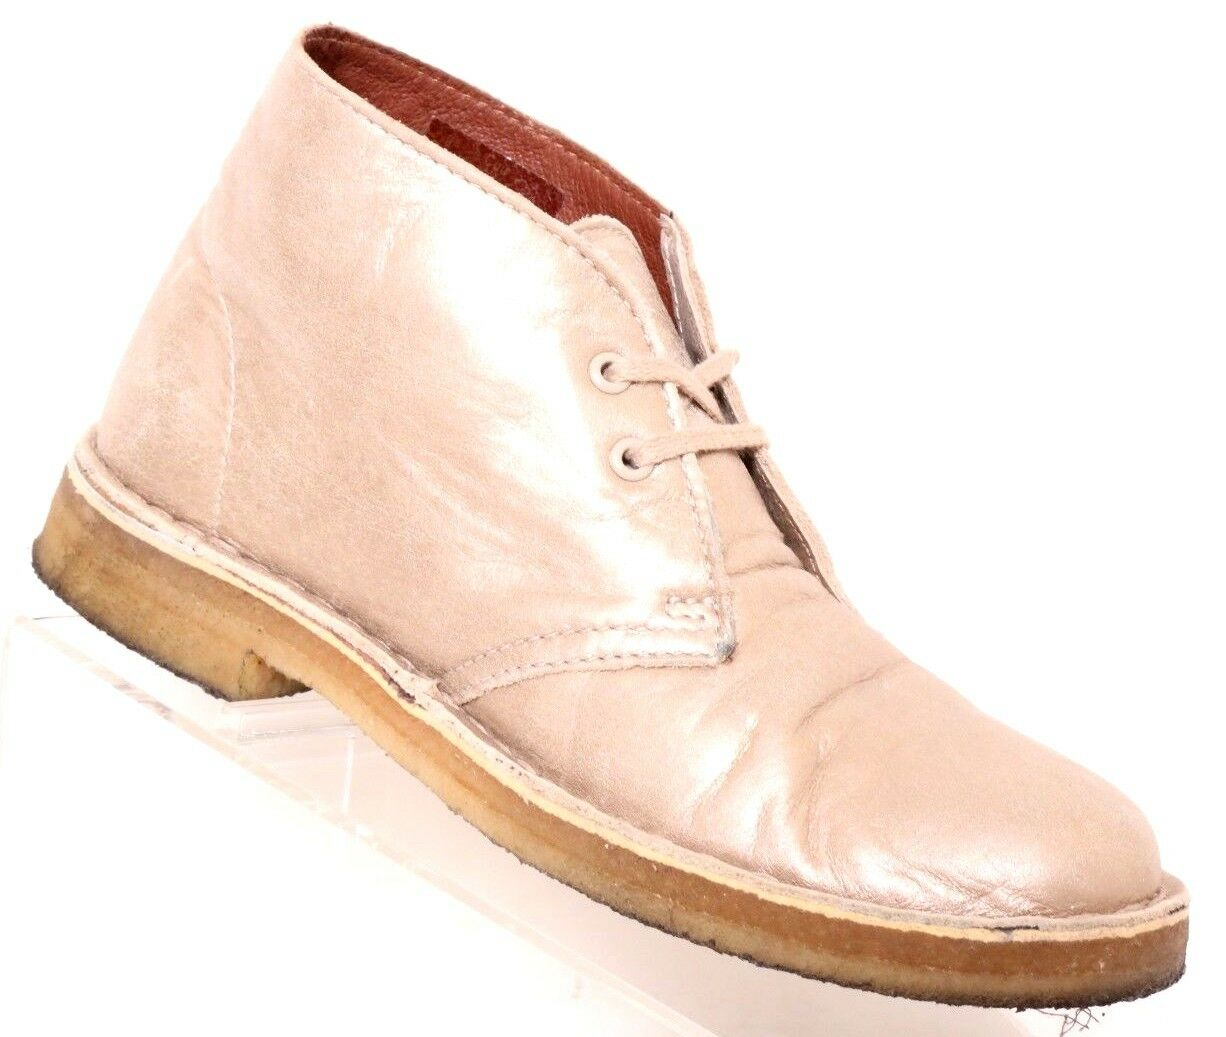 Clarks Originals gold Metallic Leather 2-Eye Crepe Sole Desert Boot Womens US 6M